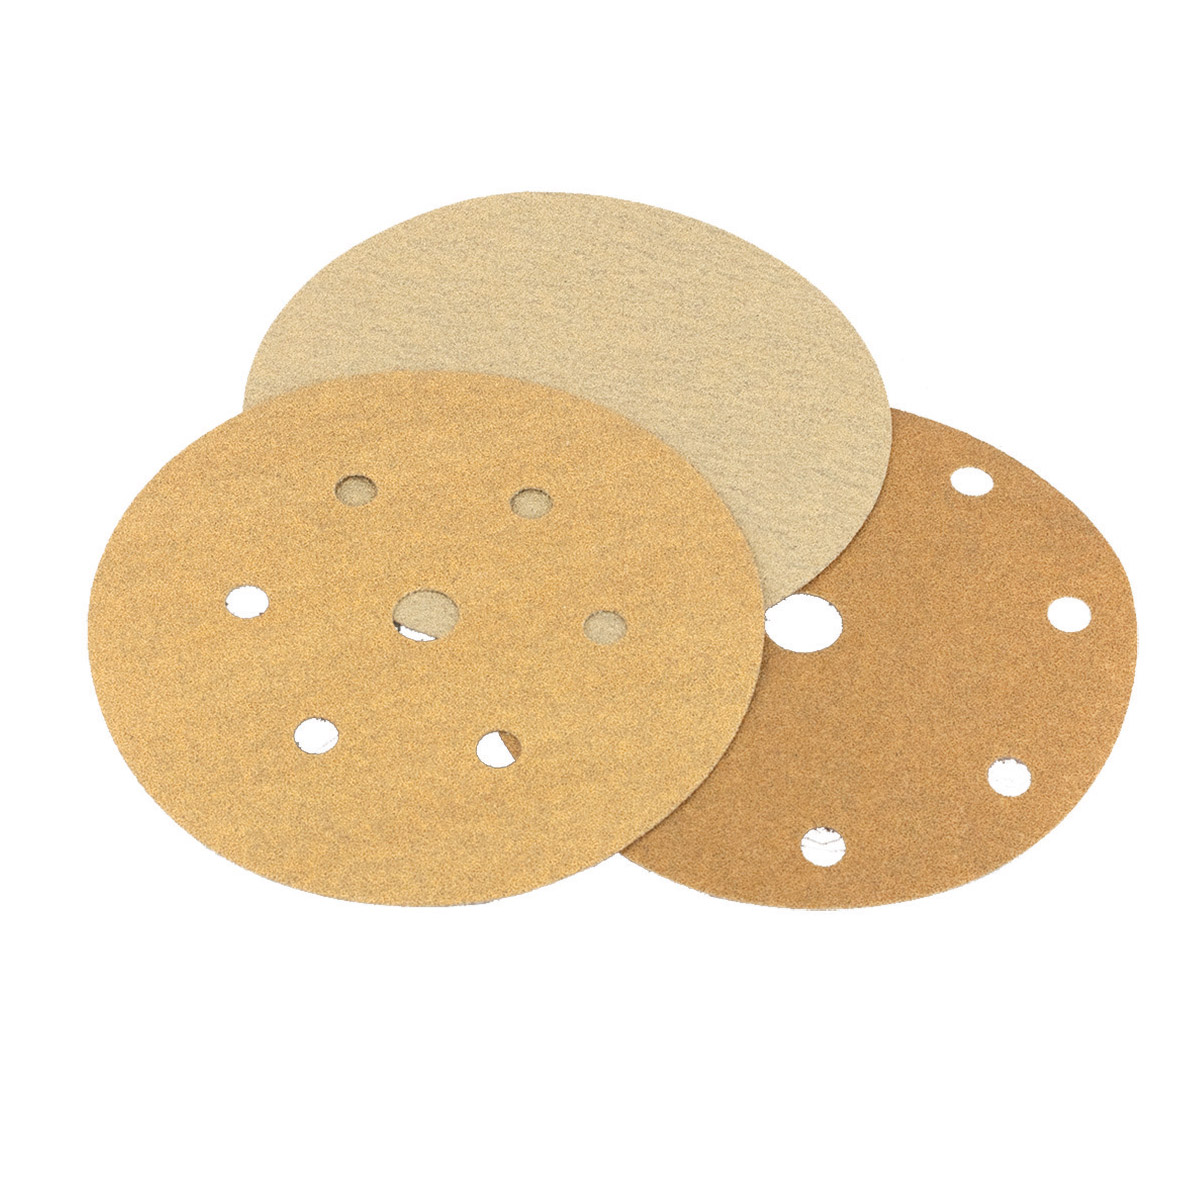 dischi velcrati in carta abrasiva peso c